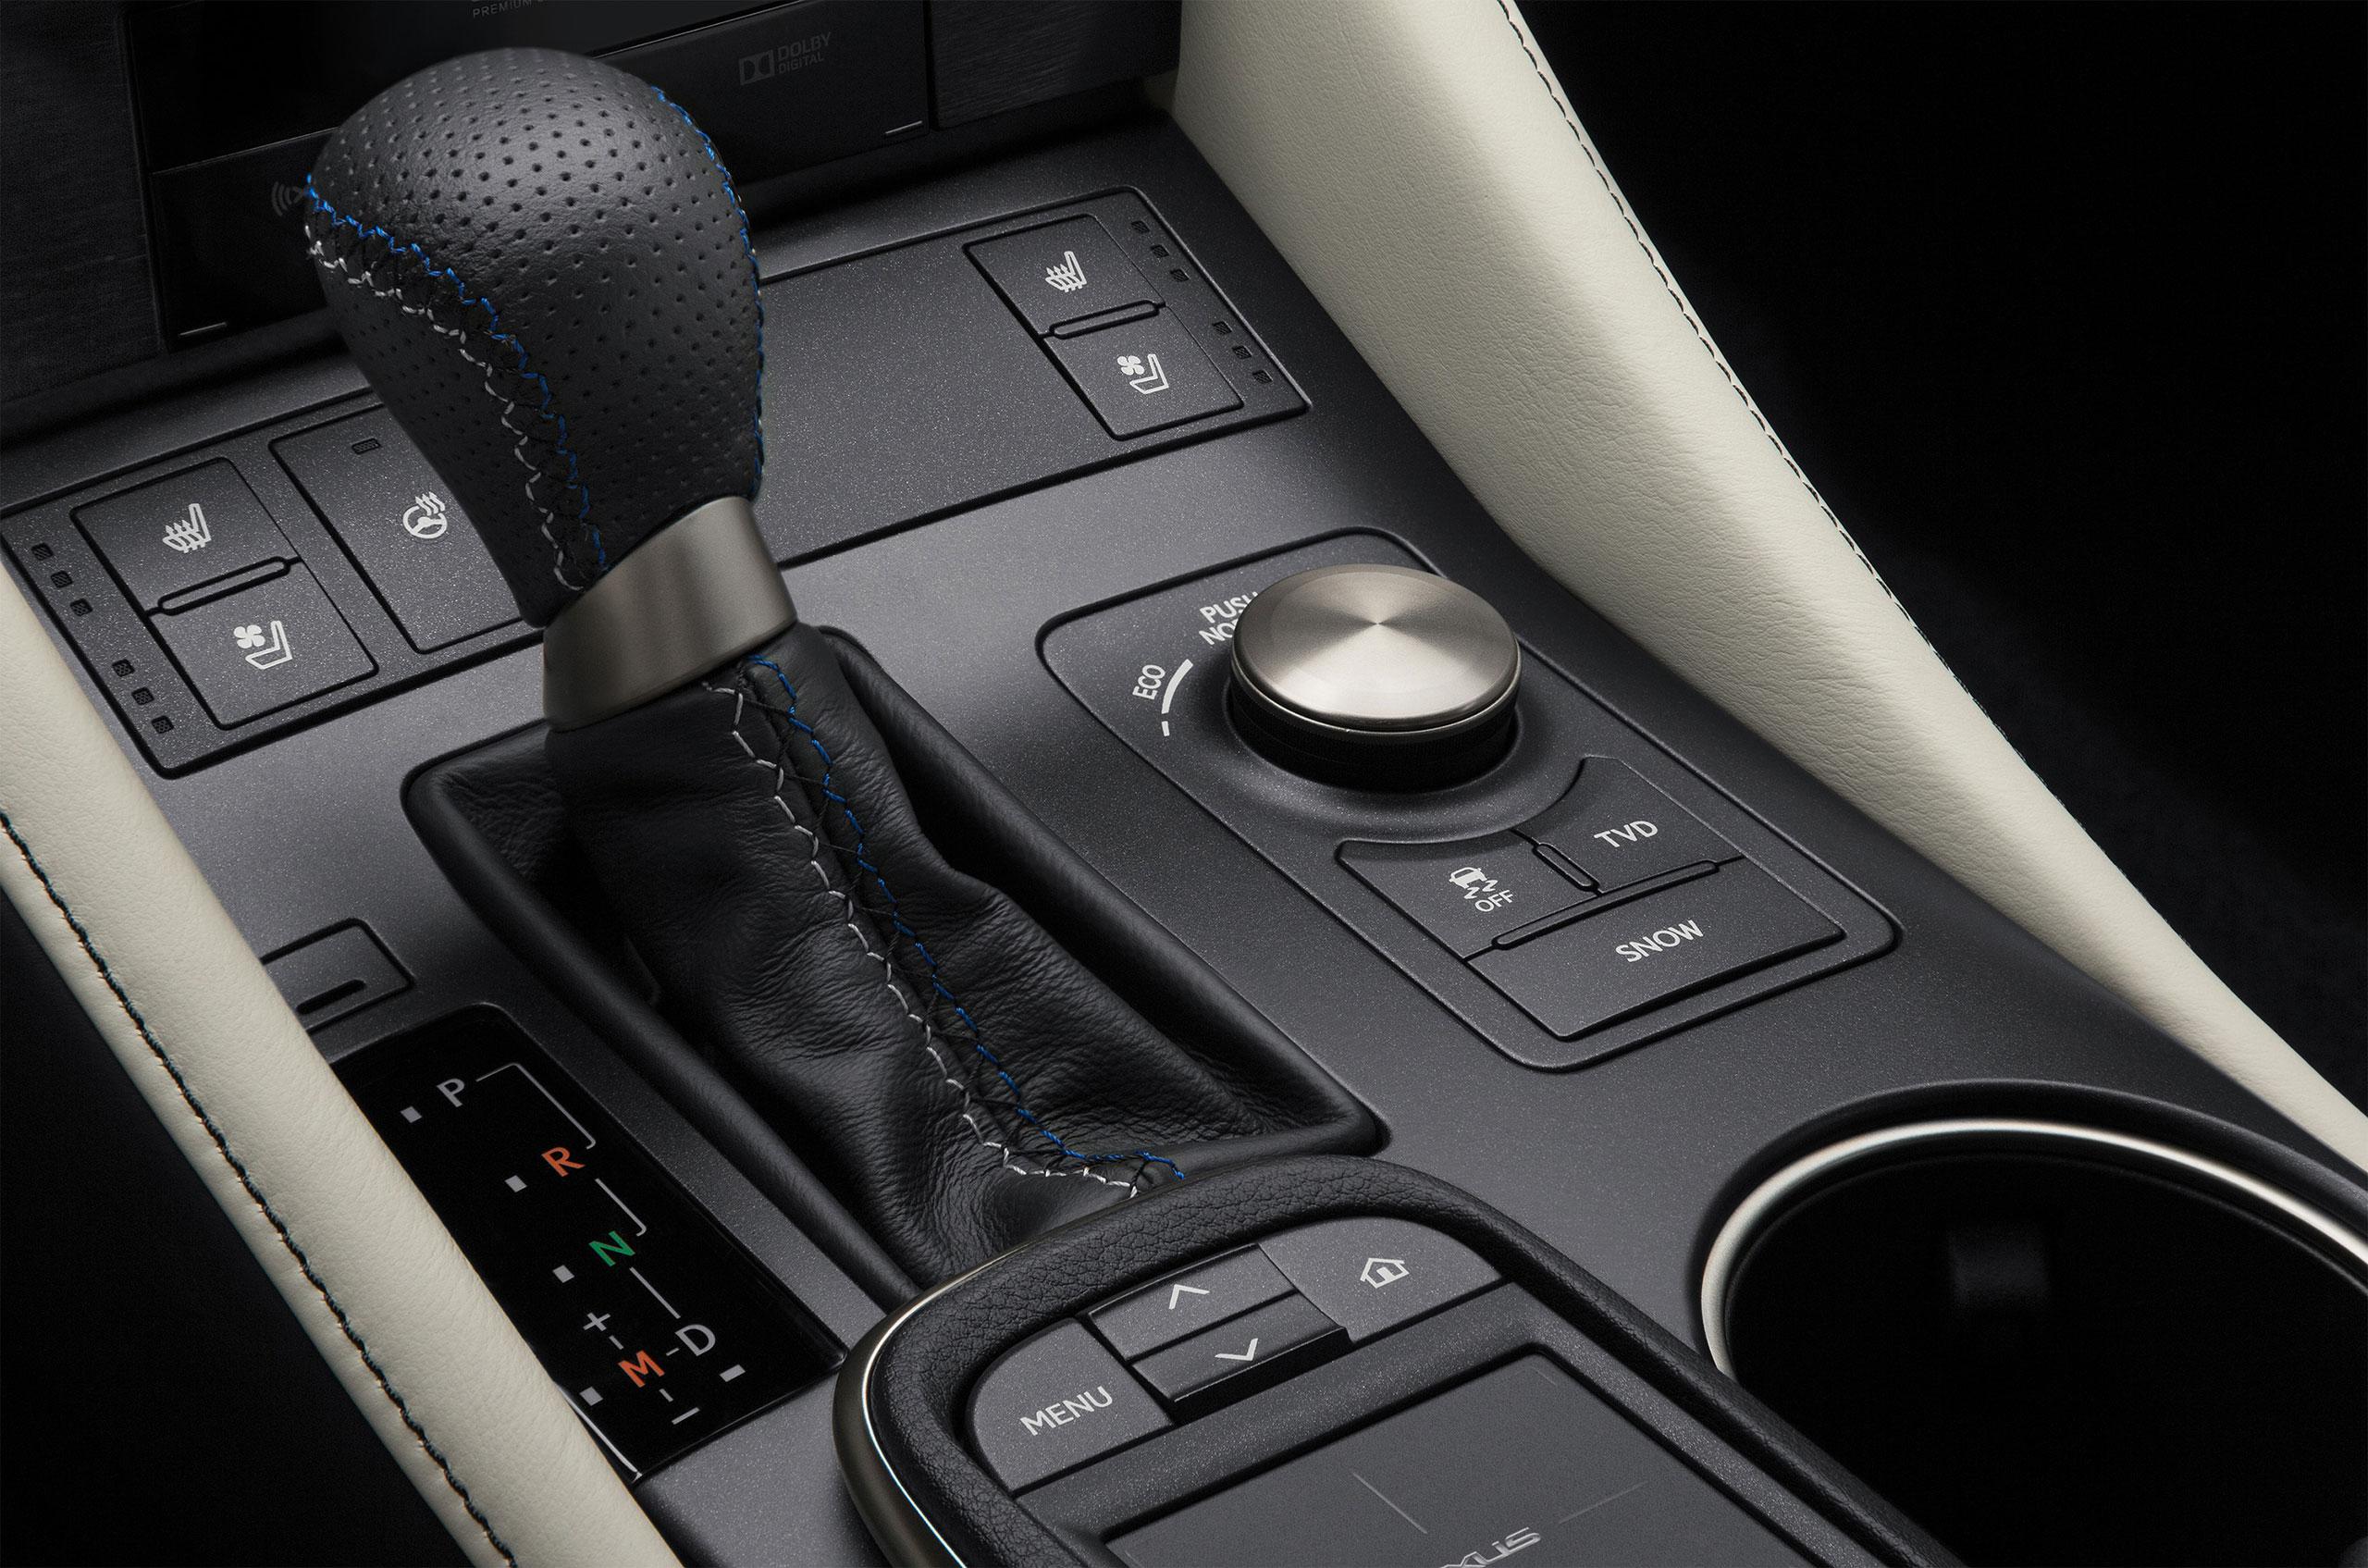 Lexus RC F Press Photo Gallery | Lexus Enthusiast